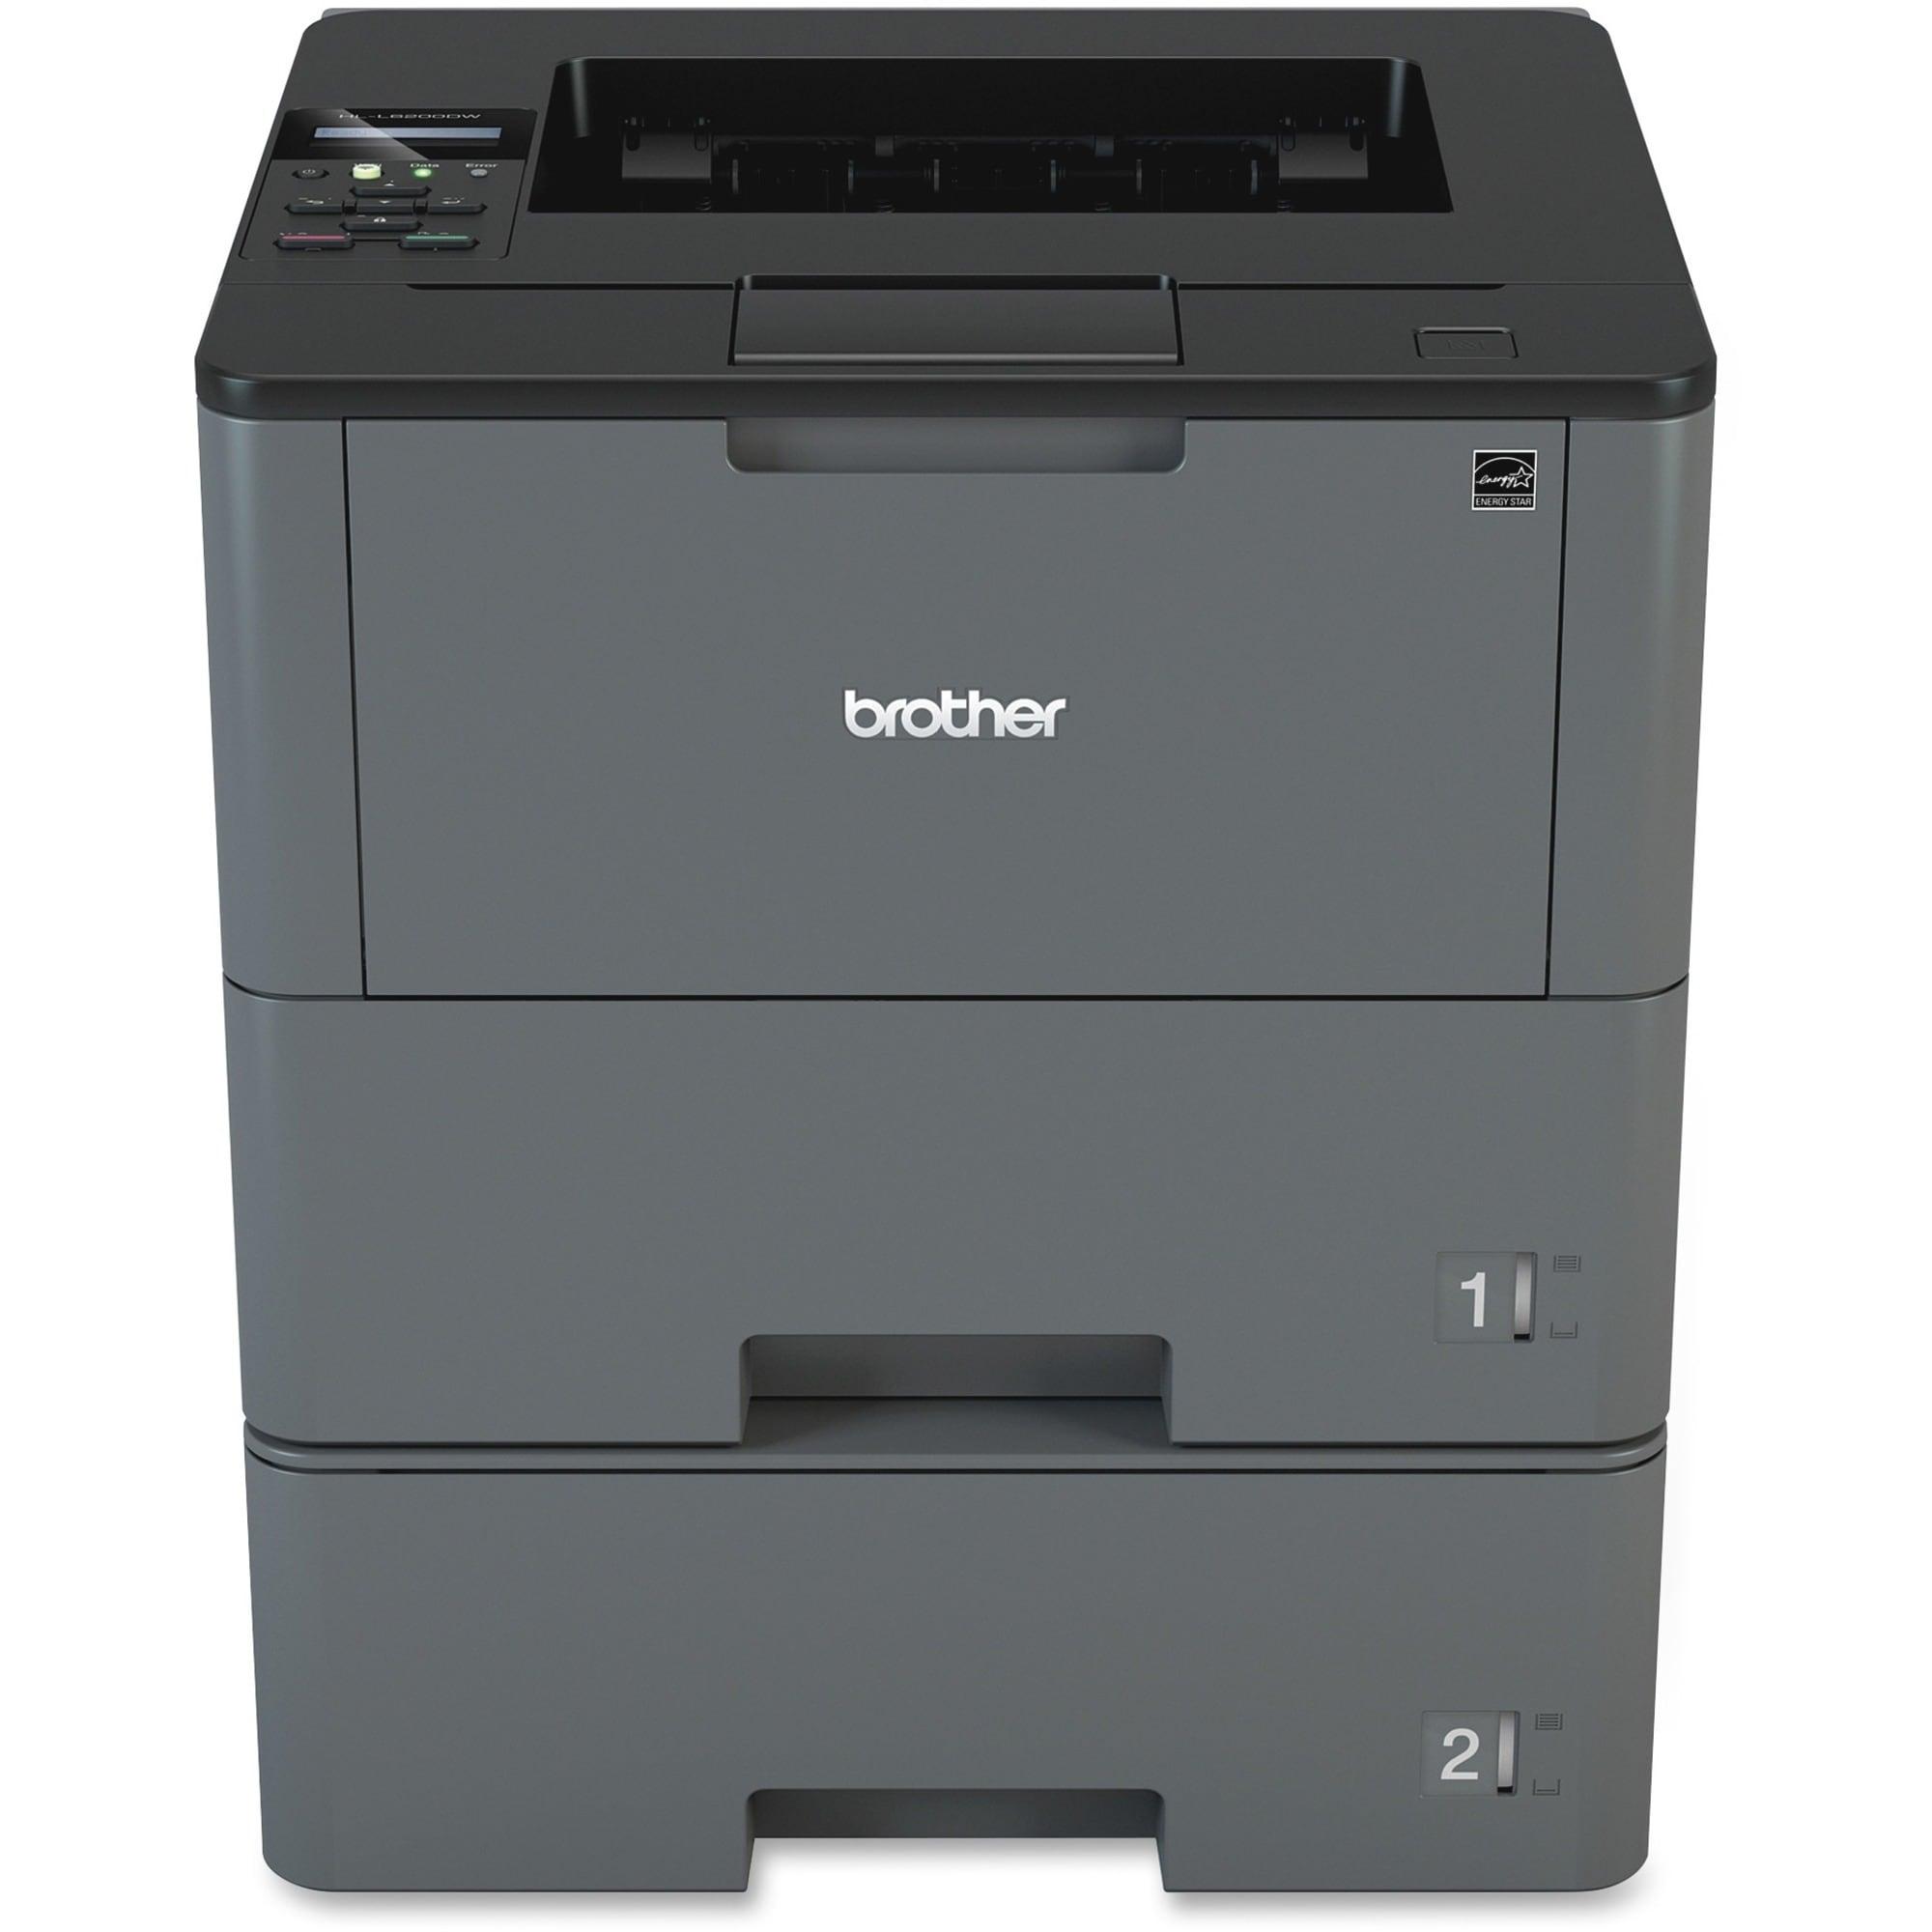 Brother Business Laser Printer HL-L6200DWT - Monochrome - Duplex Prin